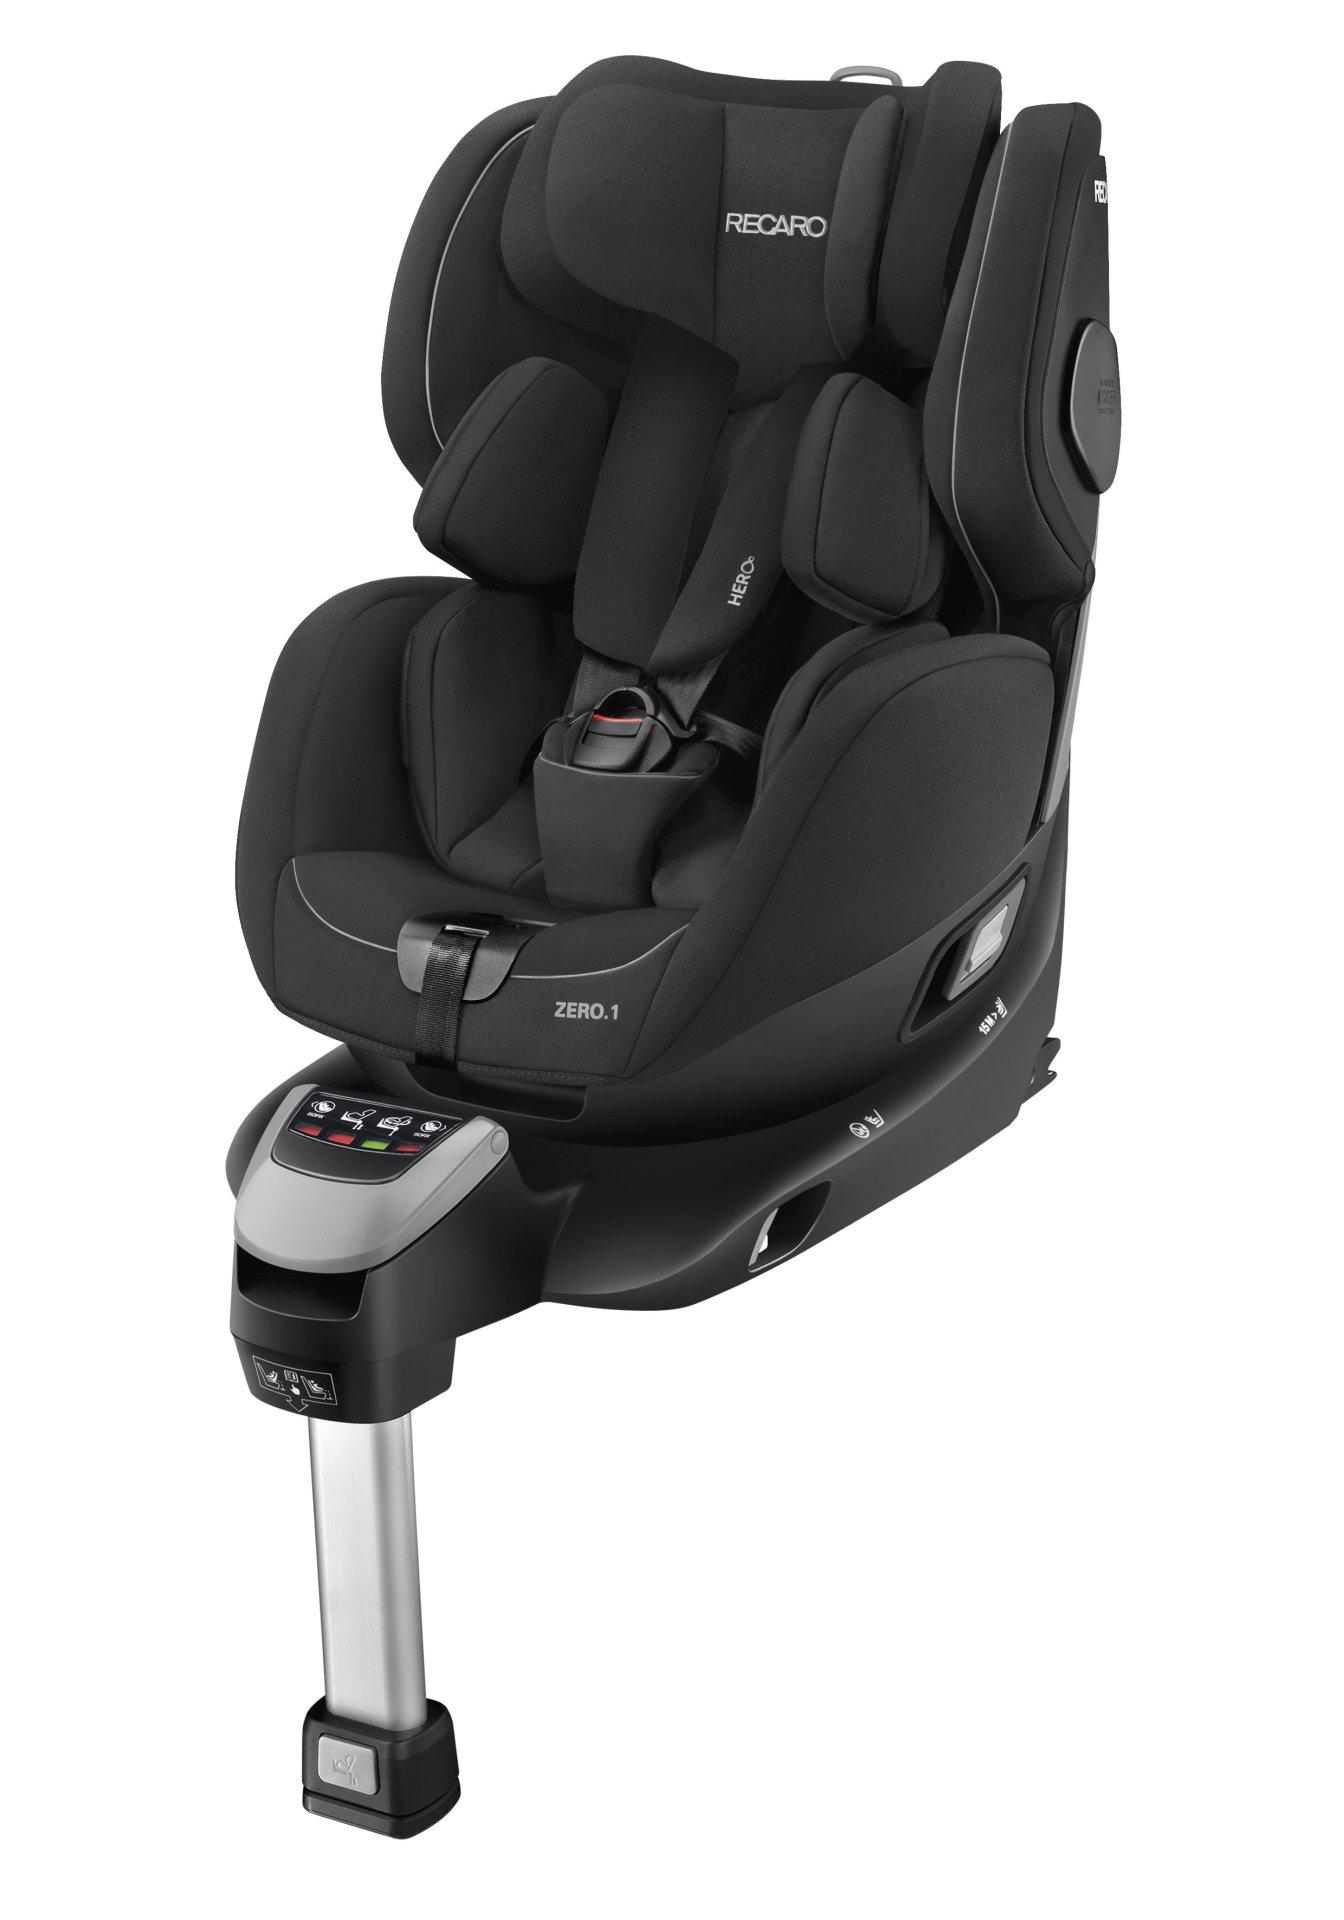 silla de coche recaro zero 1 i size con base isofix 2018 performance black comprar en kidsroom. Black Bedroom Furniture Sets. Home Design Ideas